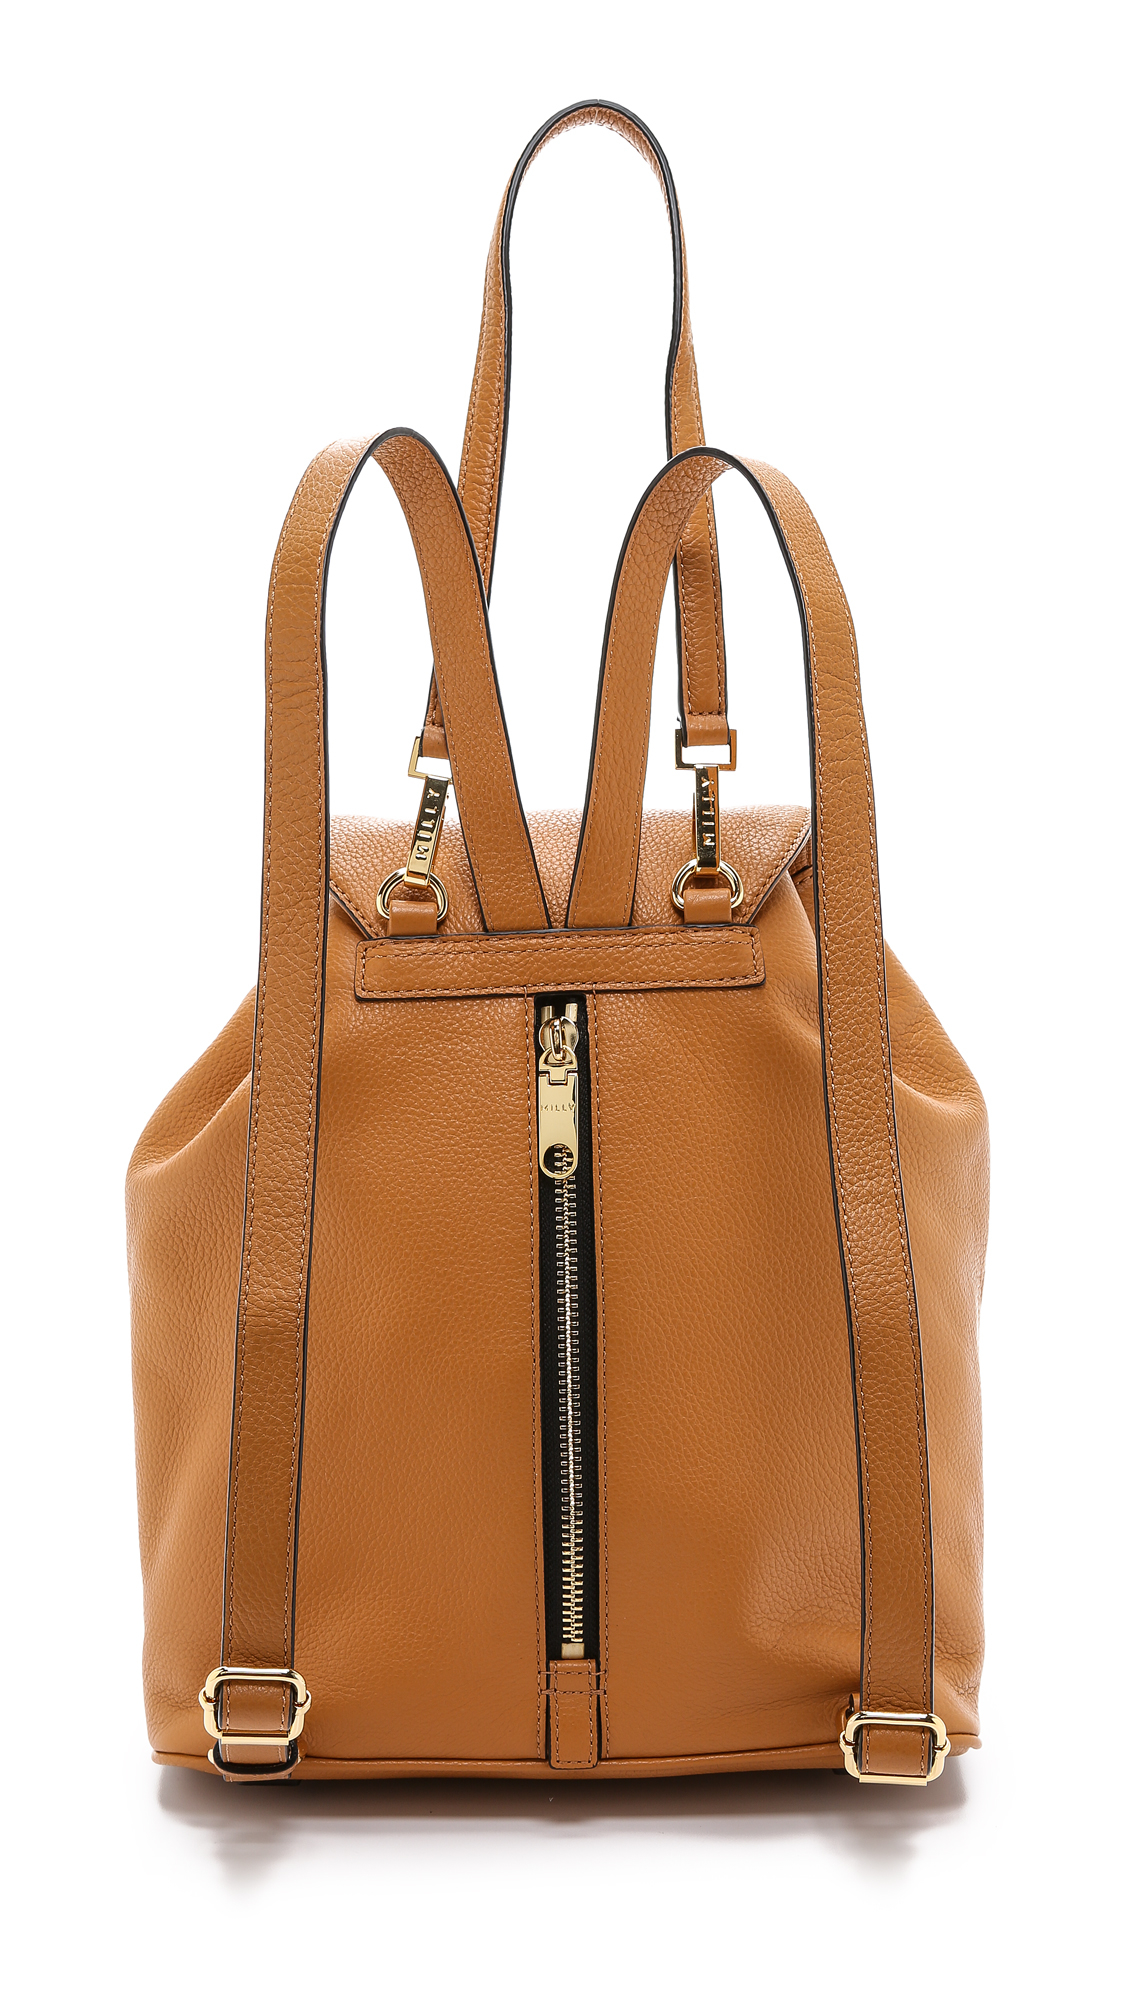 MILLY Astor Backpack - Black in Caramel (Brown)